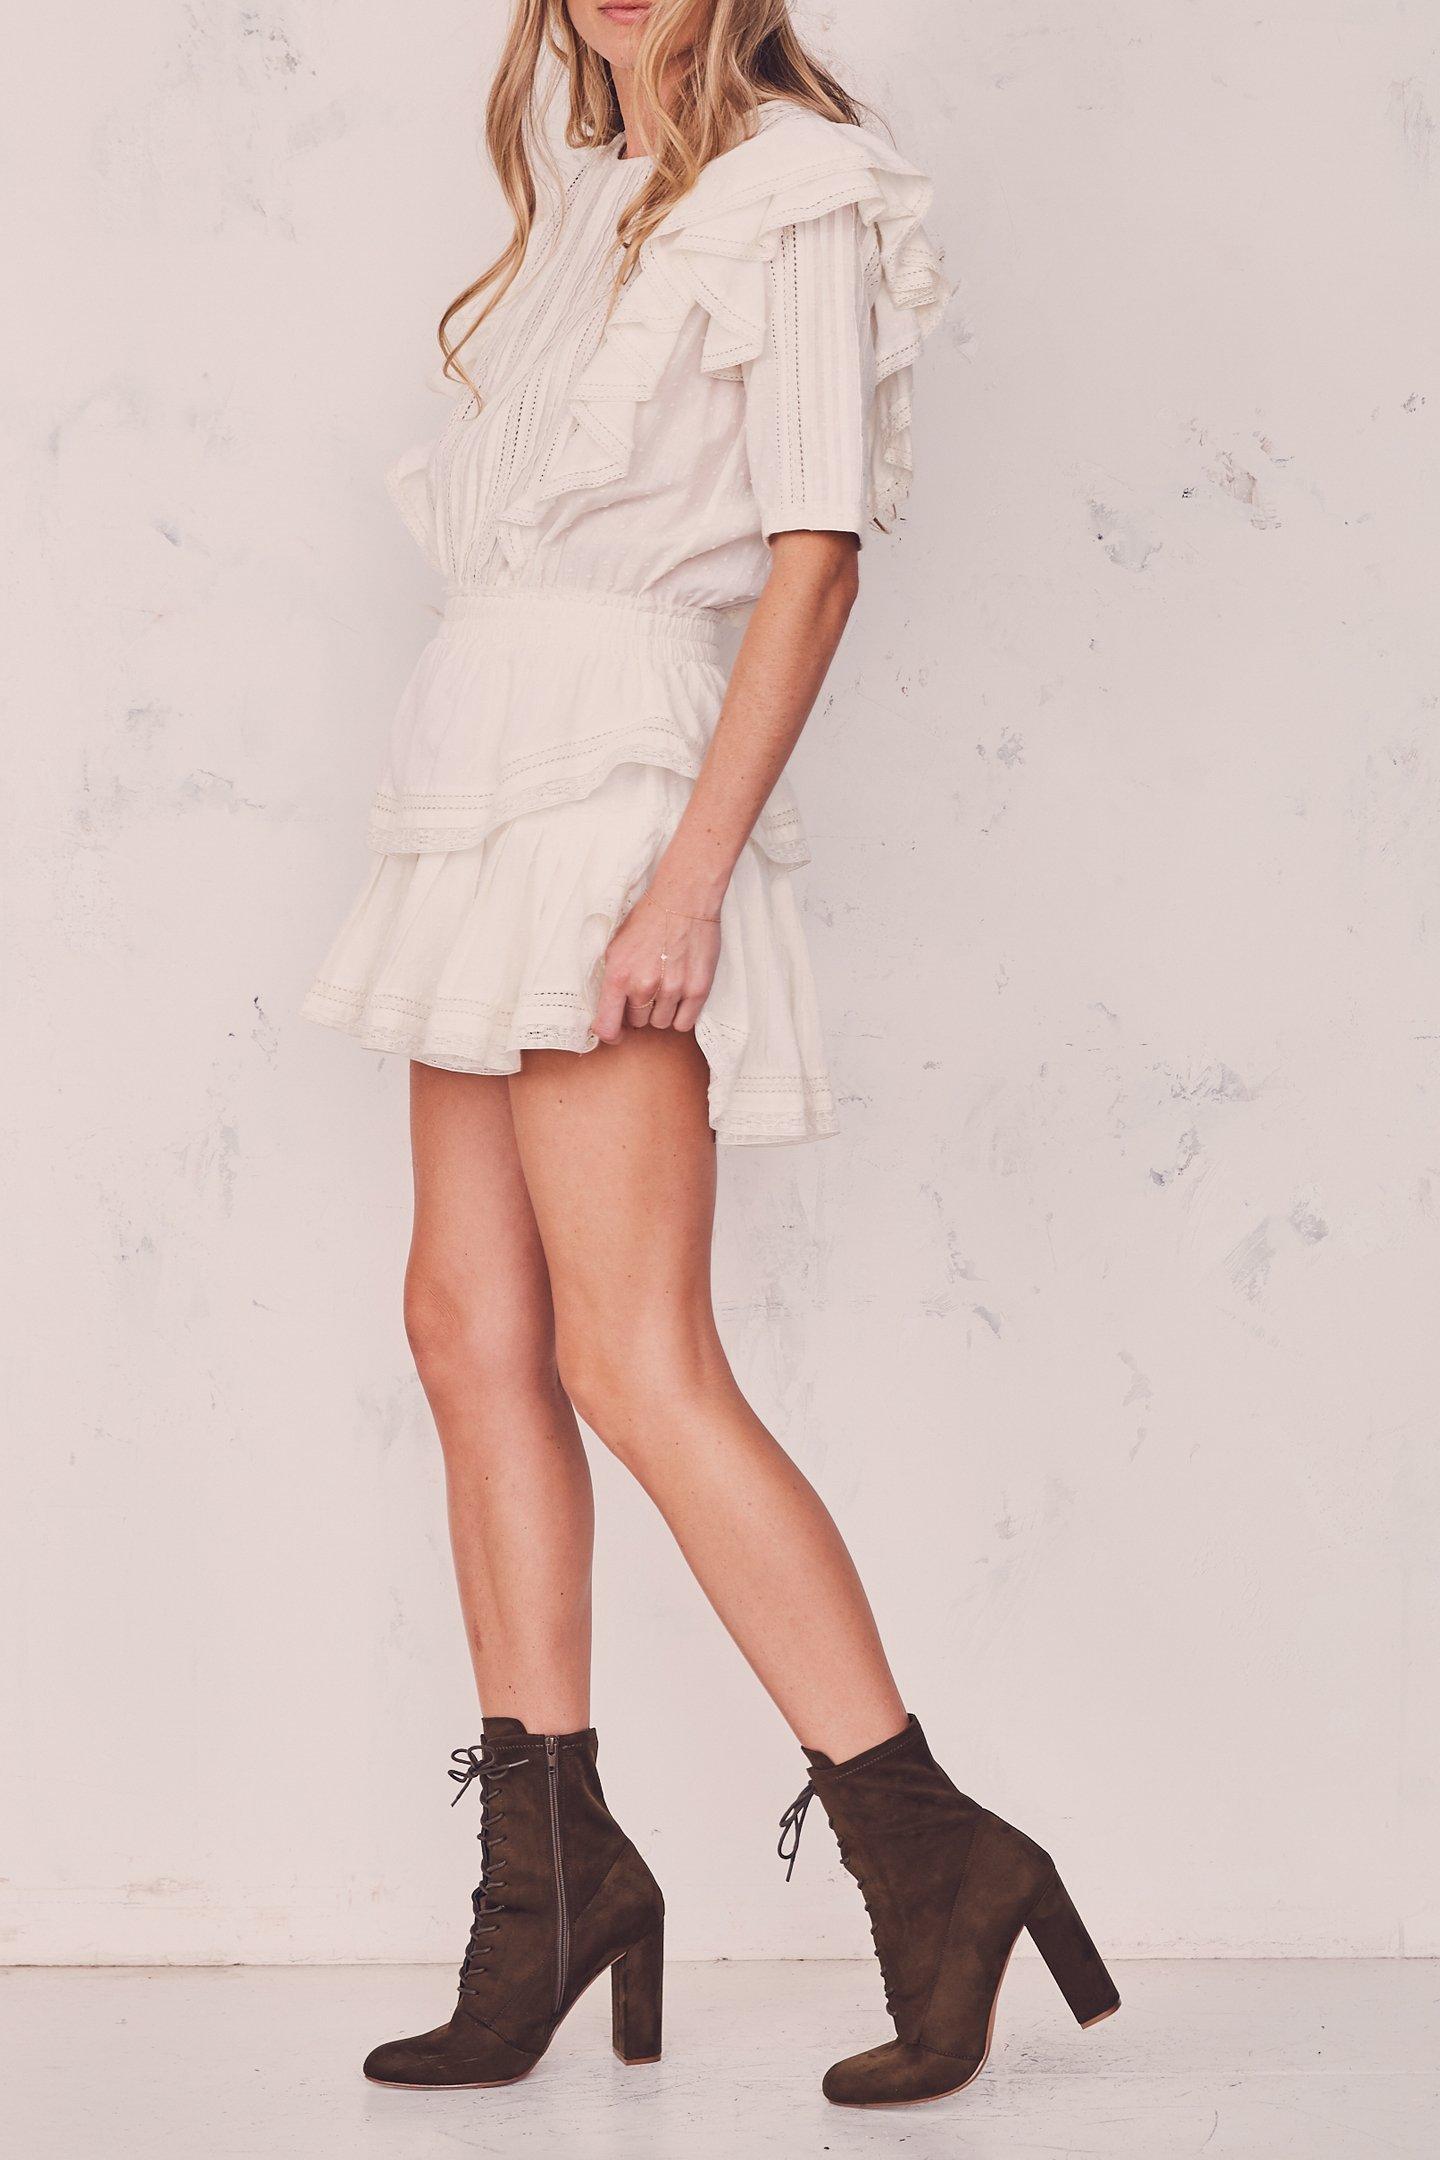 natasha_dress_loveshackfancy_swiss_dot_white_1_e531e6bc-d09b-4a3f-b934-fe9076d247ae